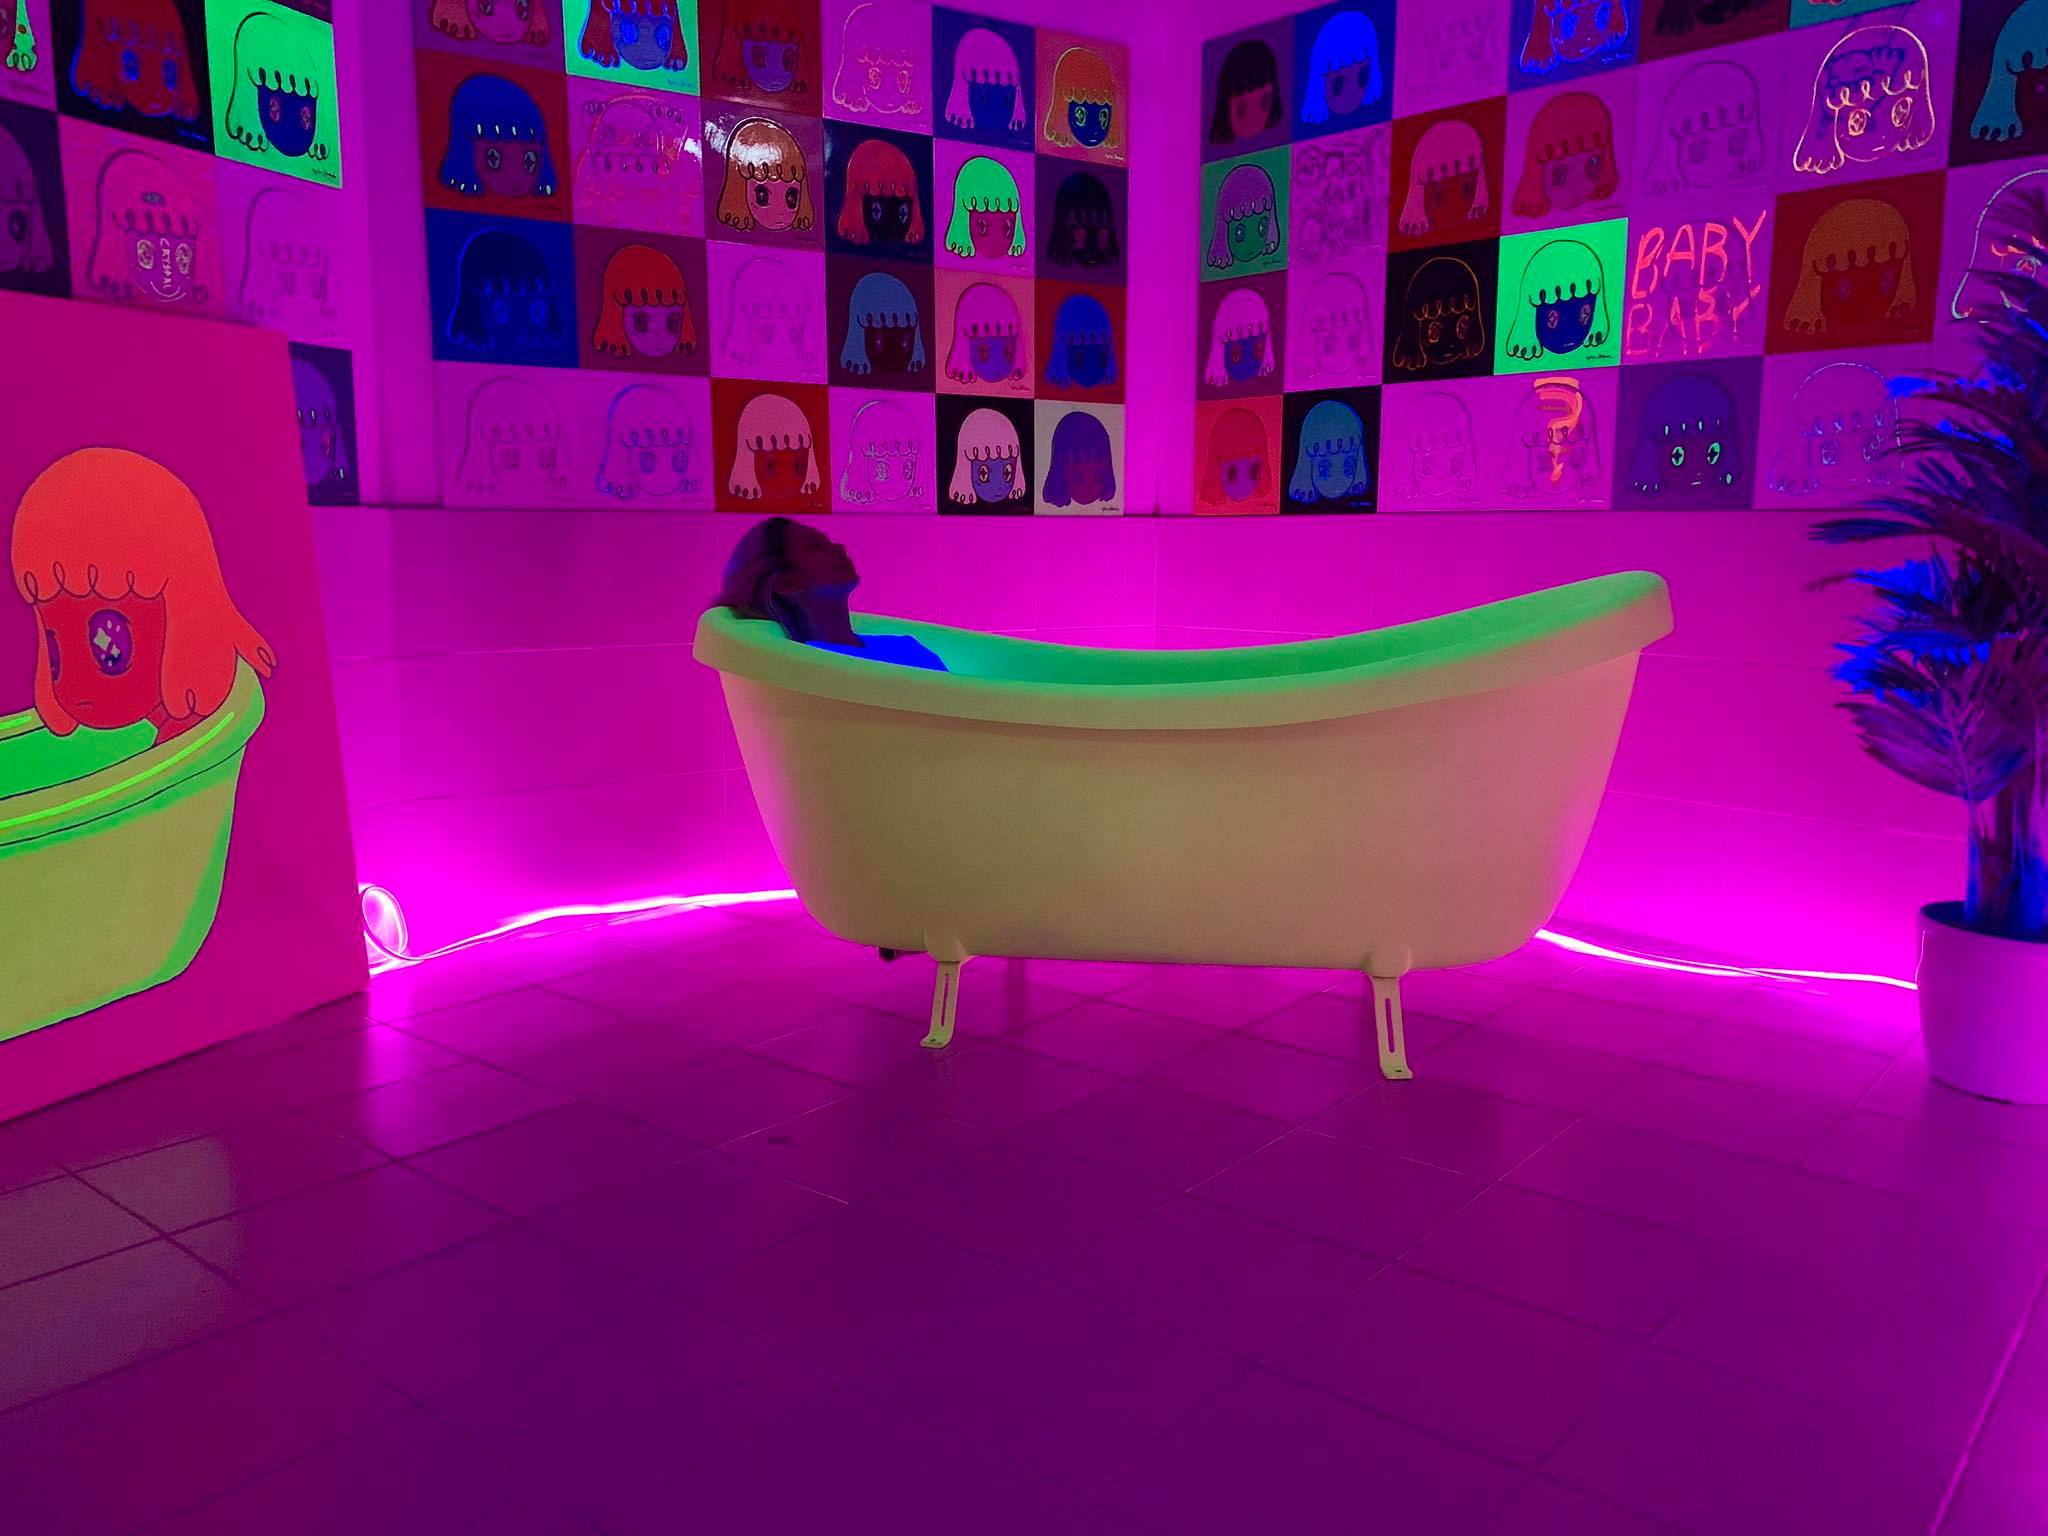 Yeo Kaa, 'I Don't Know, Baby', 2019, installation view. Image courtesy of Yeo Kaa.